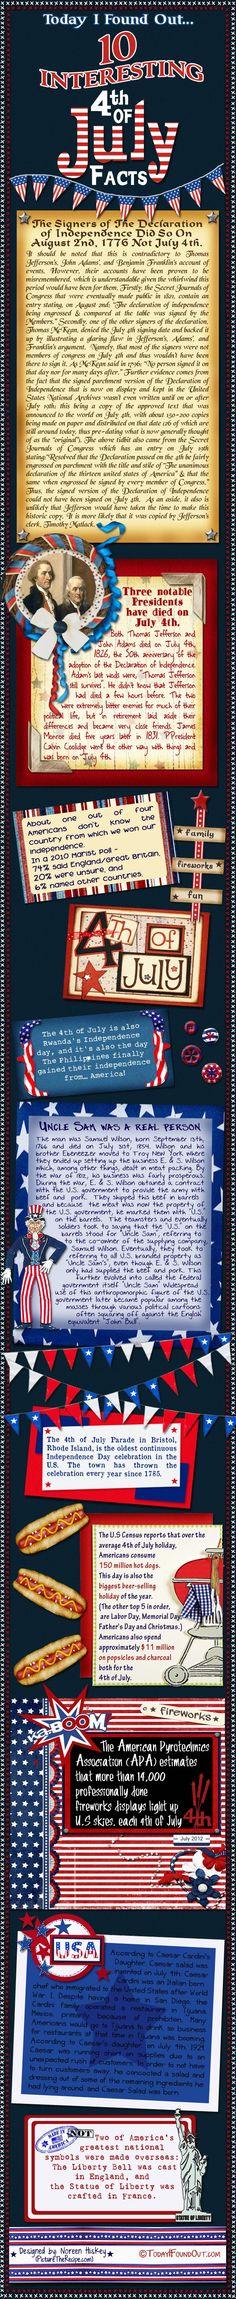 4th of July facts - todayifoundout.com